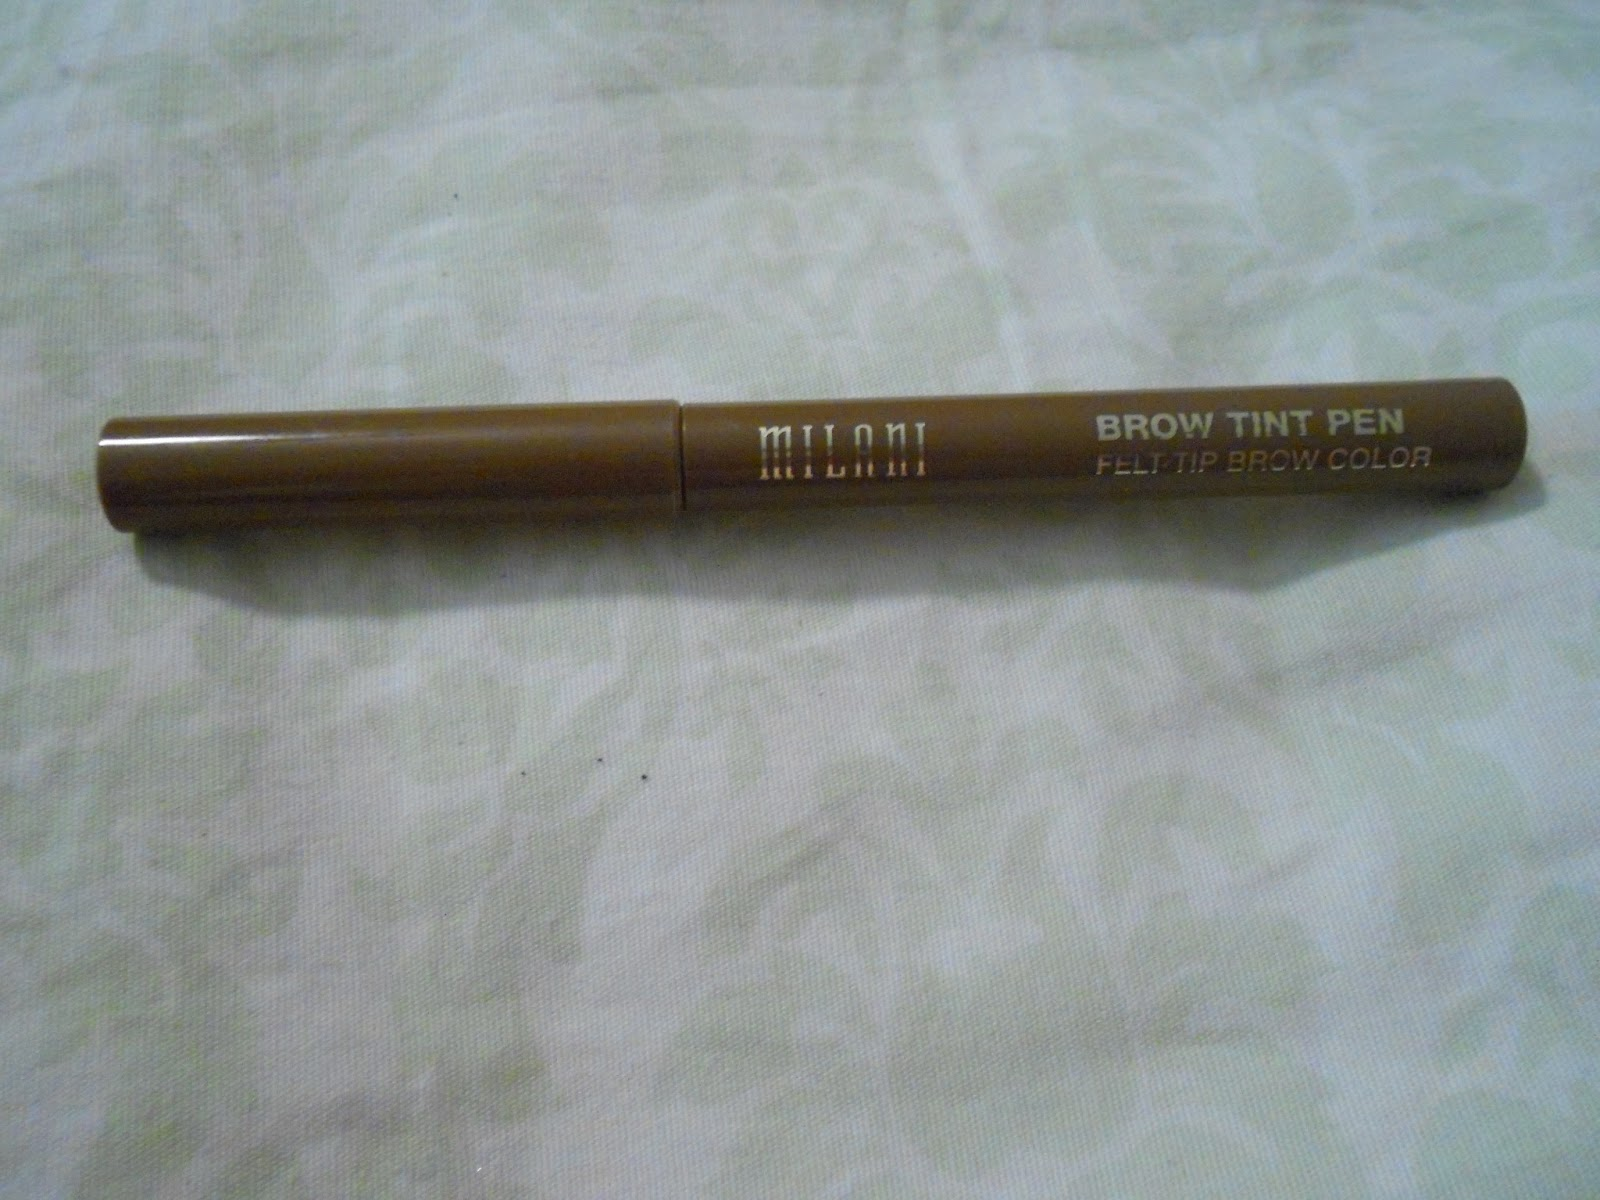 Brow Tint Pen by Milani #14